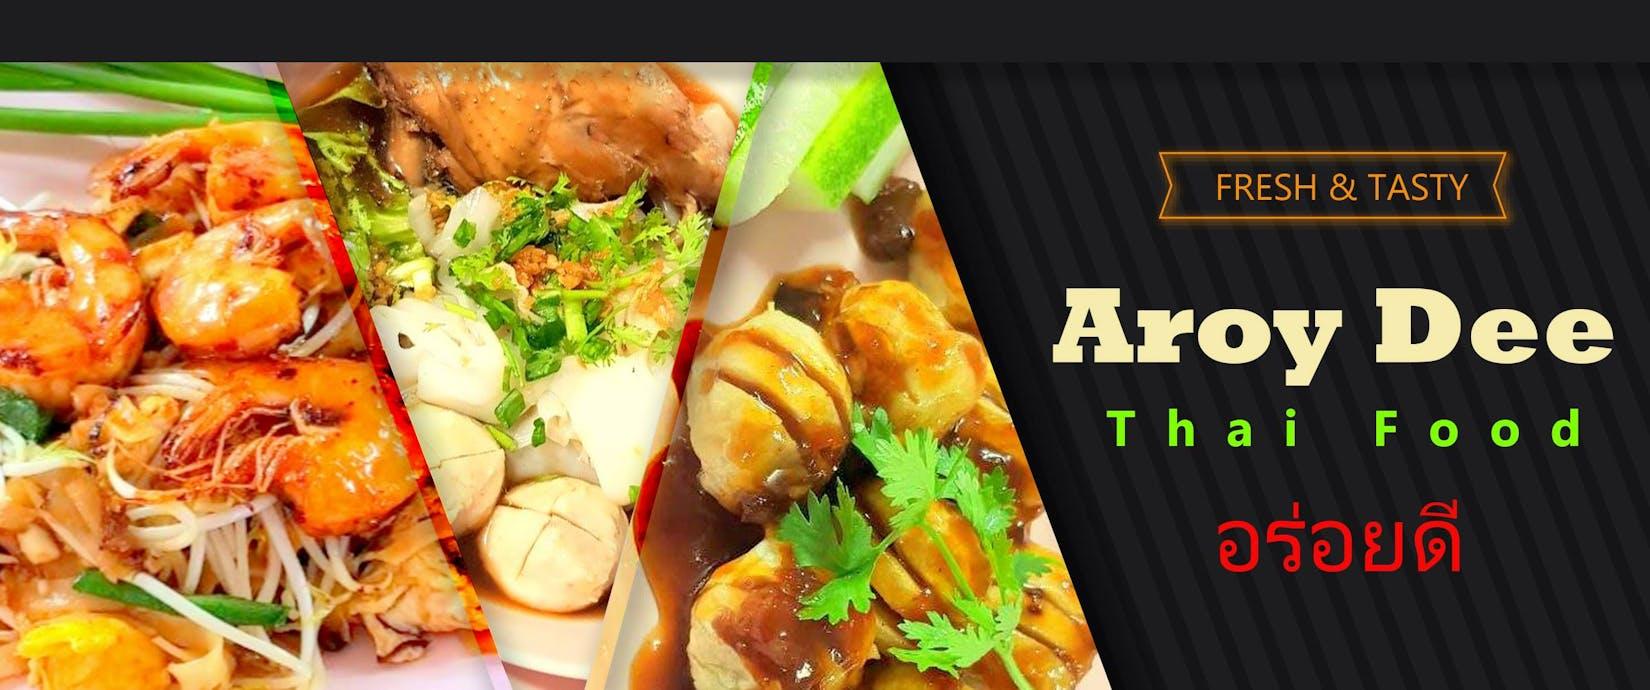 Aroy dee Thai Food | yathar